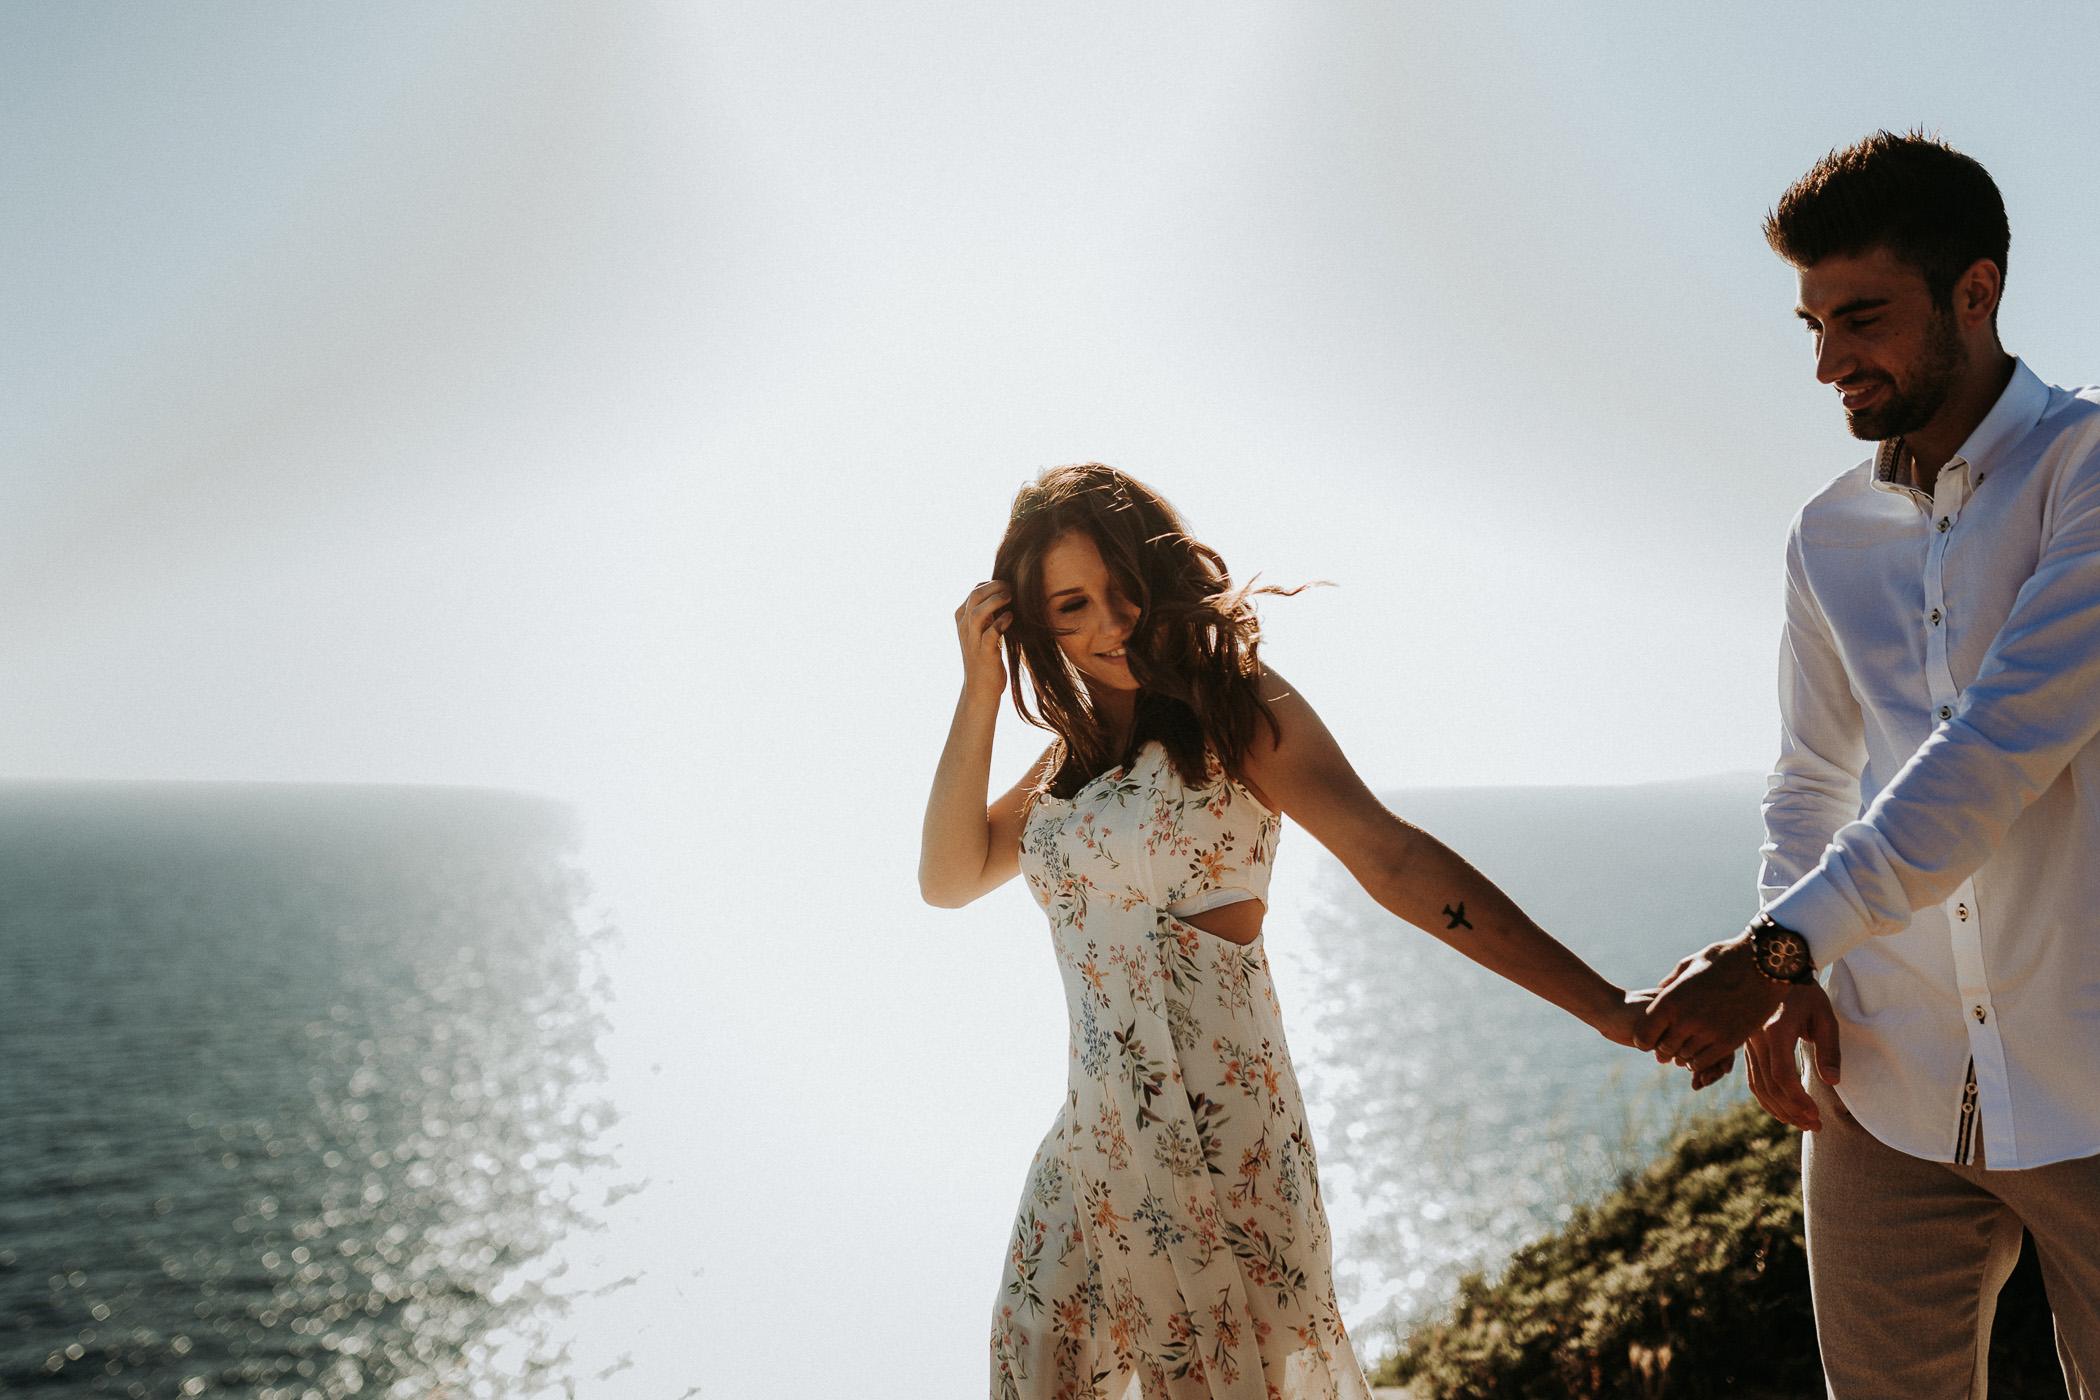 DanielaMarquardtPhotography_wedding_elopement_mallorca_spain_calapi_palma_lauraandtoni_69